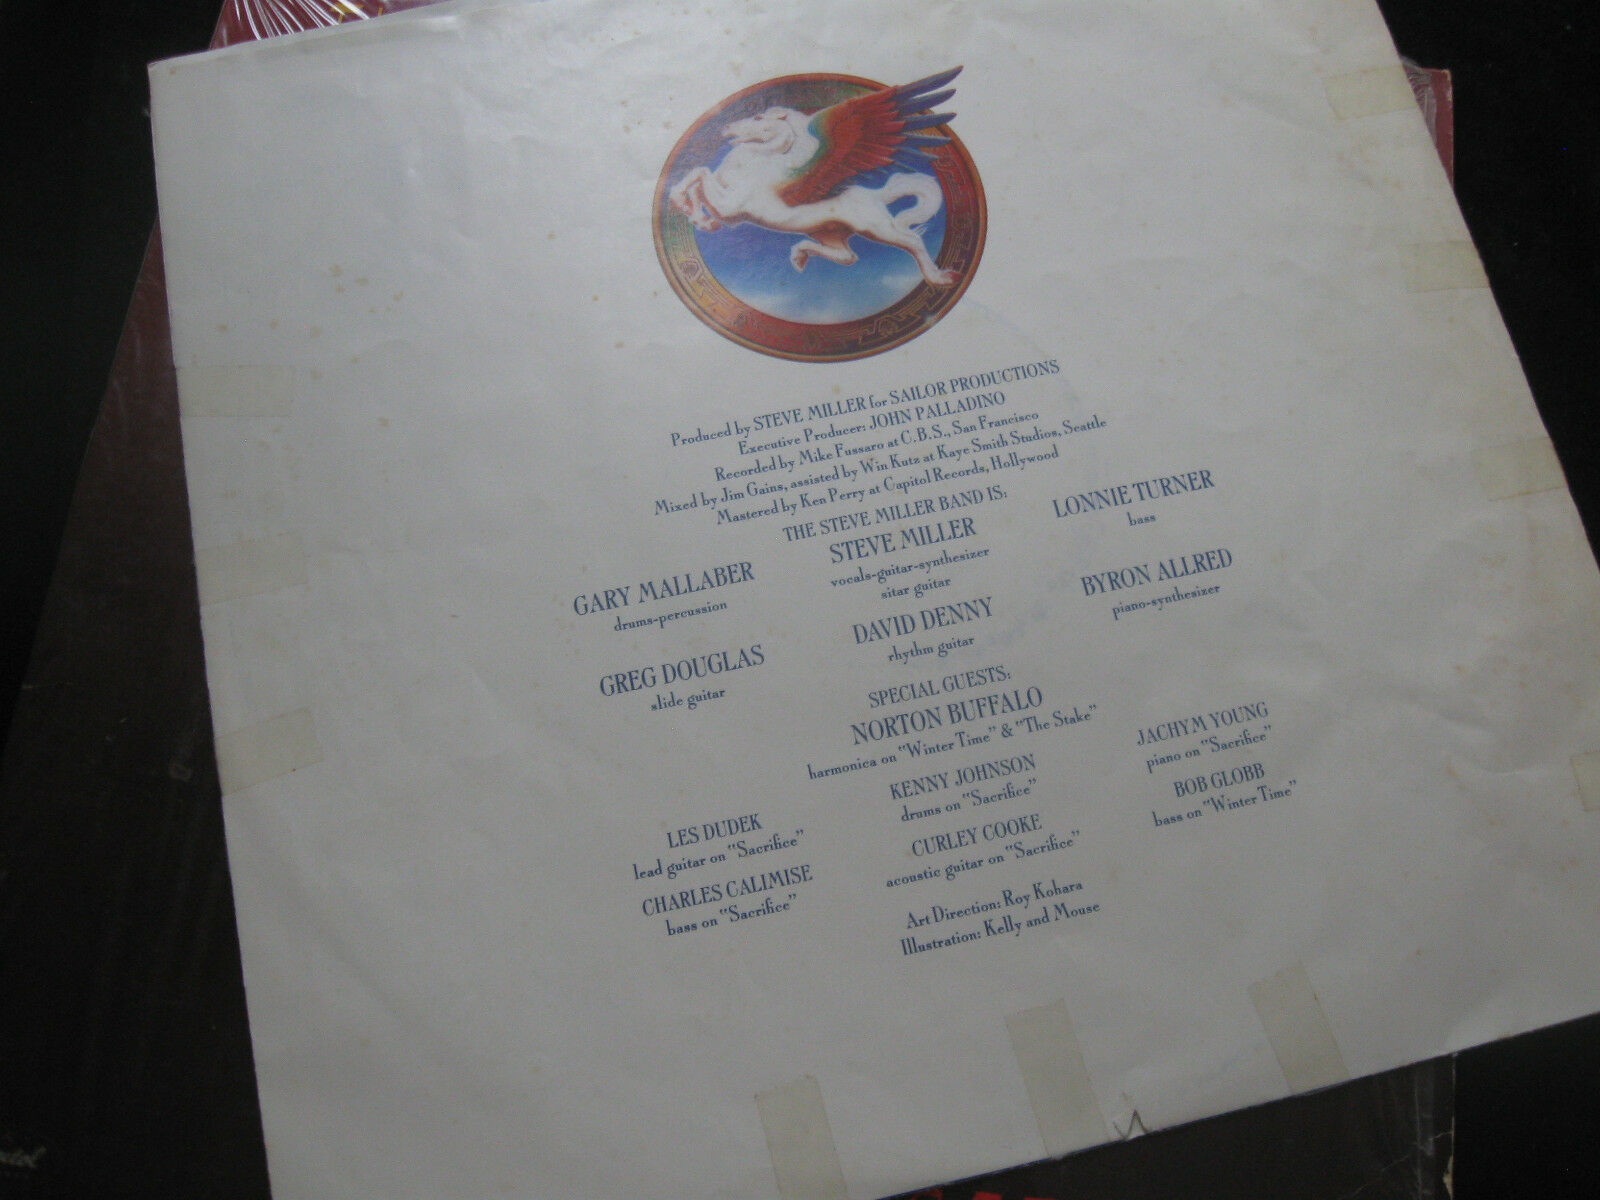 Steve Miller Band Book Of Dreams Capitol SQ-11630 Vinyl Record LP Open Shrink image 3